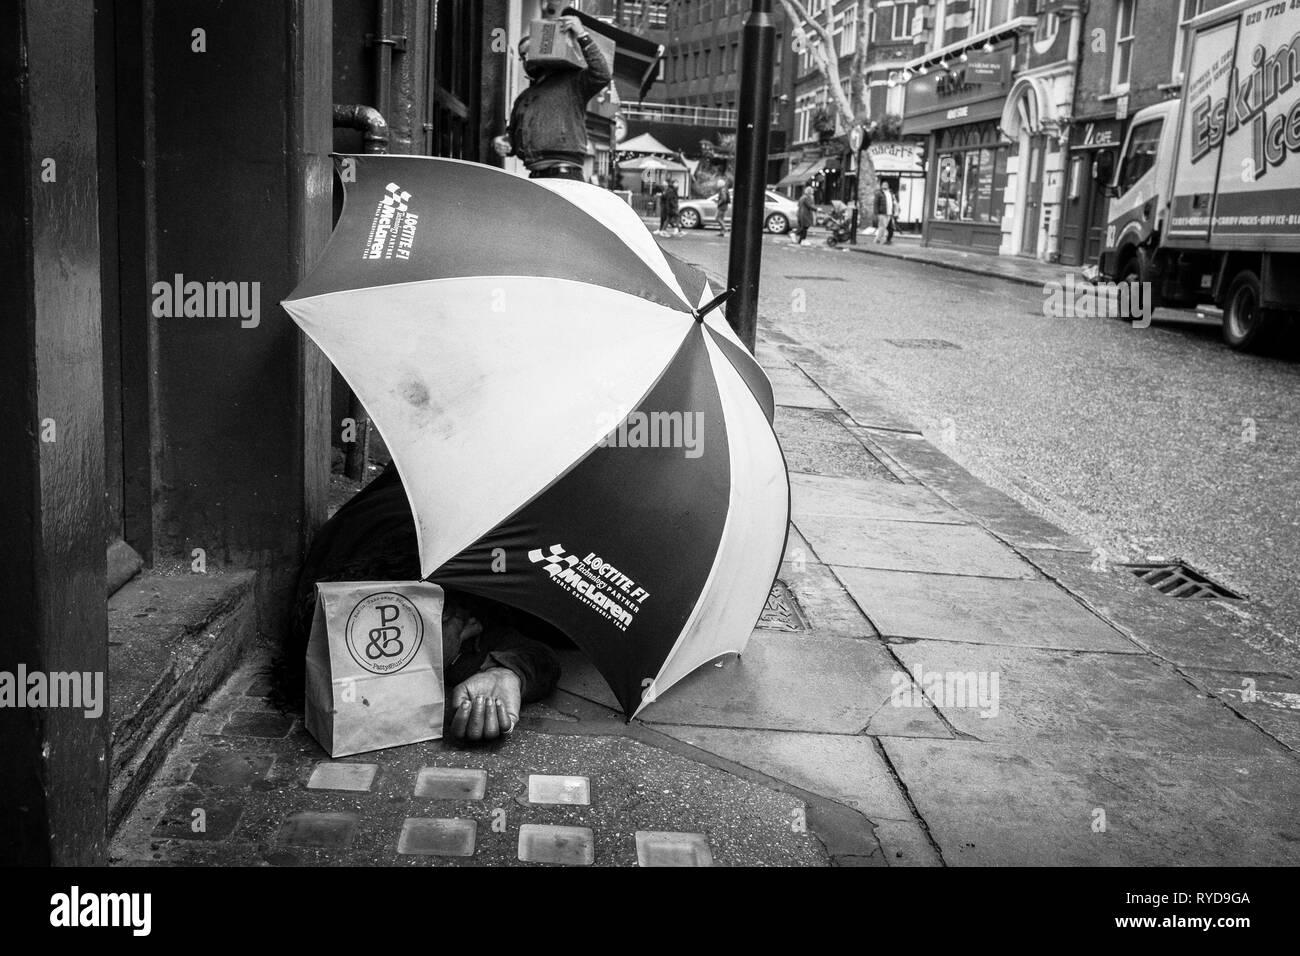 Homeless man using large umbrella for shelter on central London street. UK - Stock Image